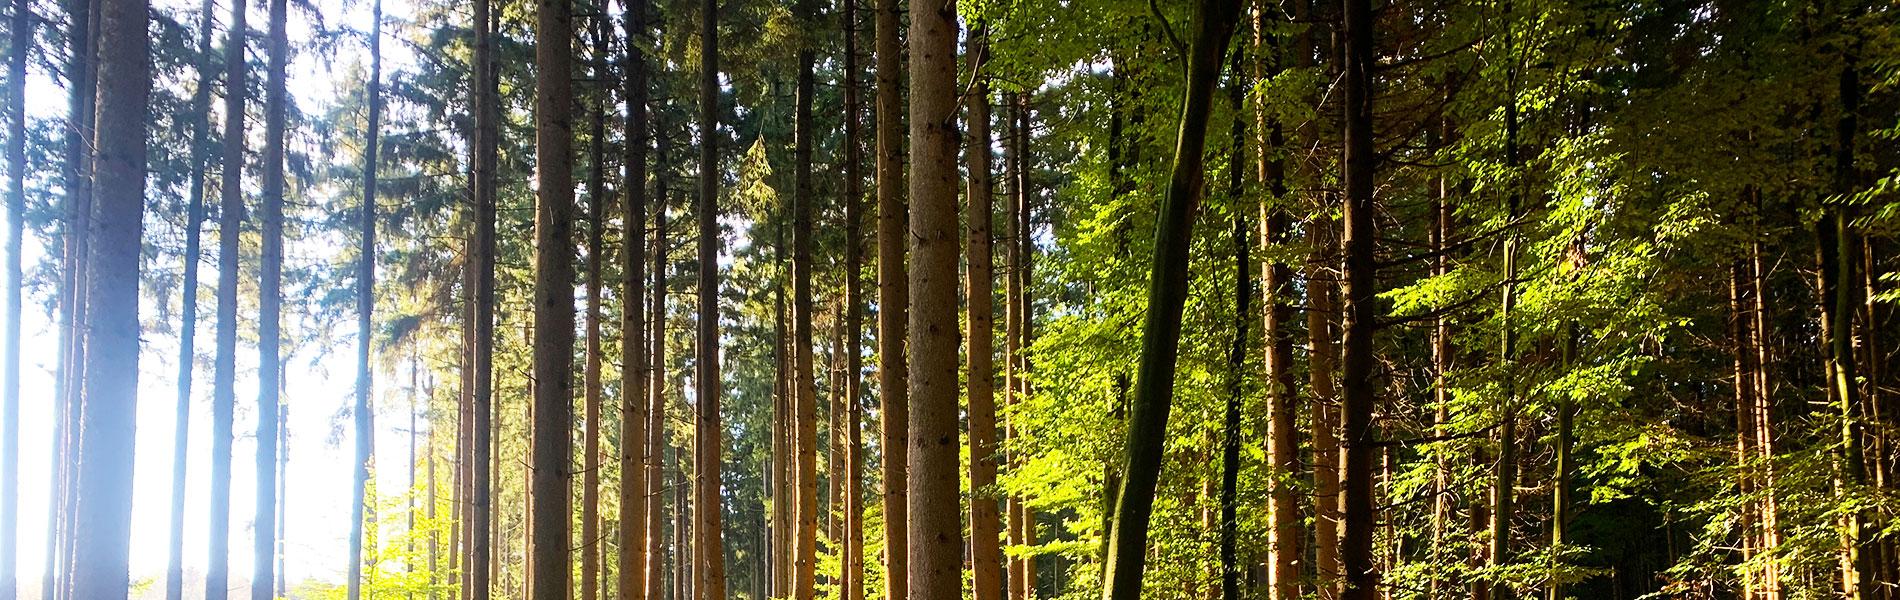 Wald in Kühbach